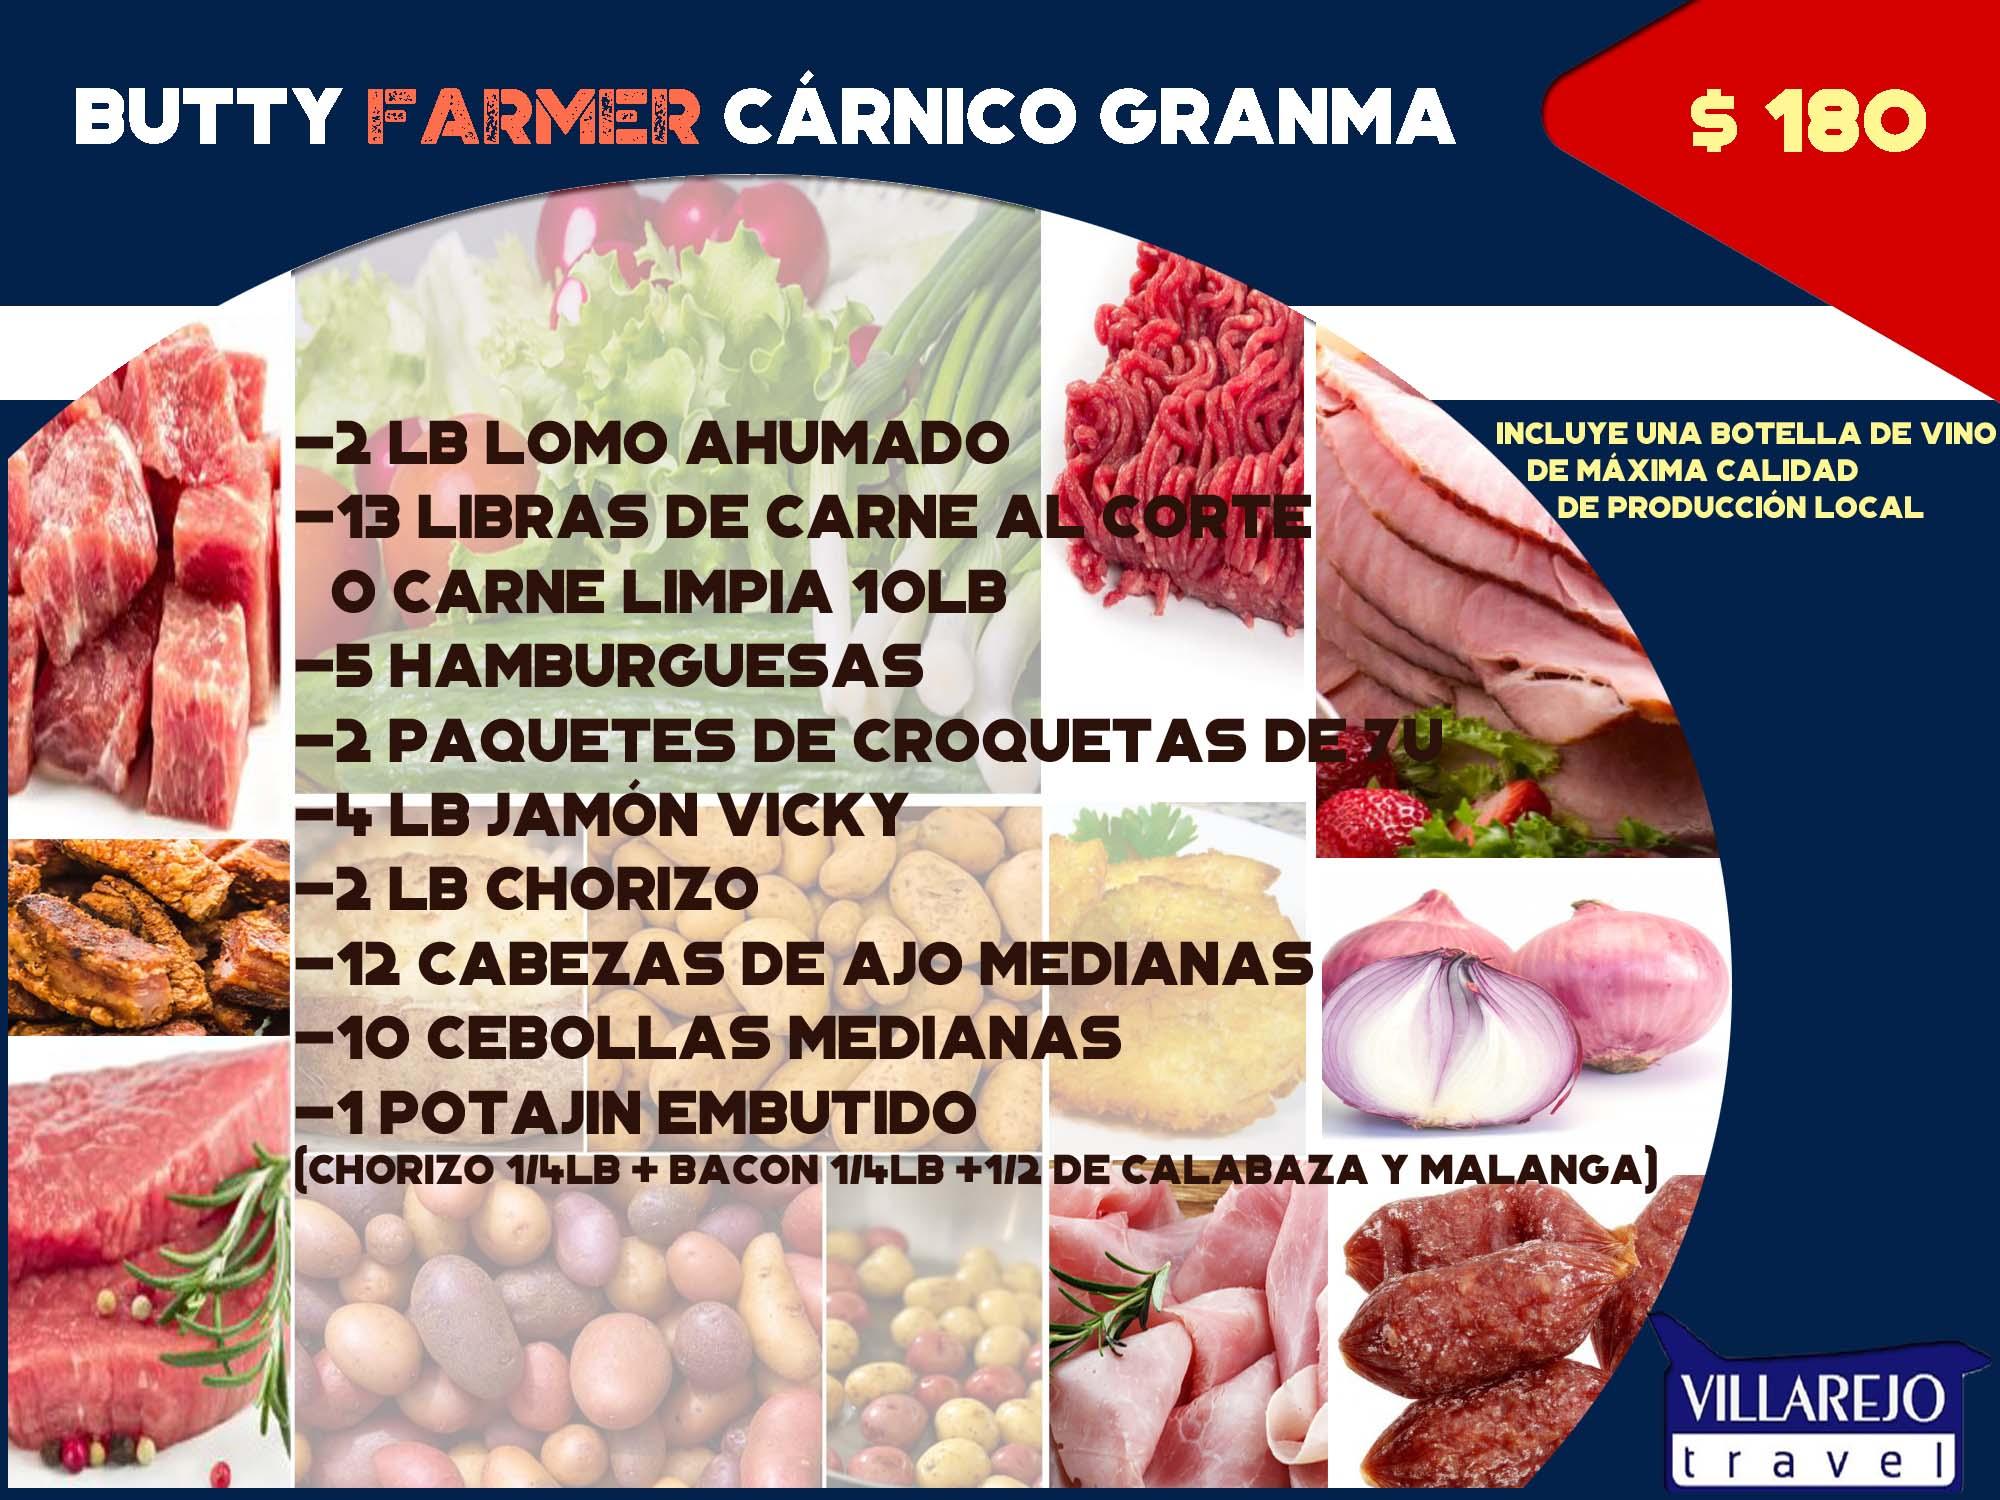 COMBO # 14 Butty Farmer Cárnico Granma